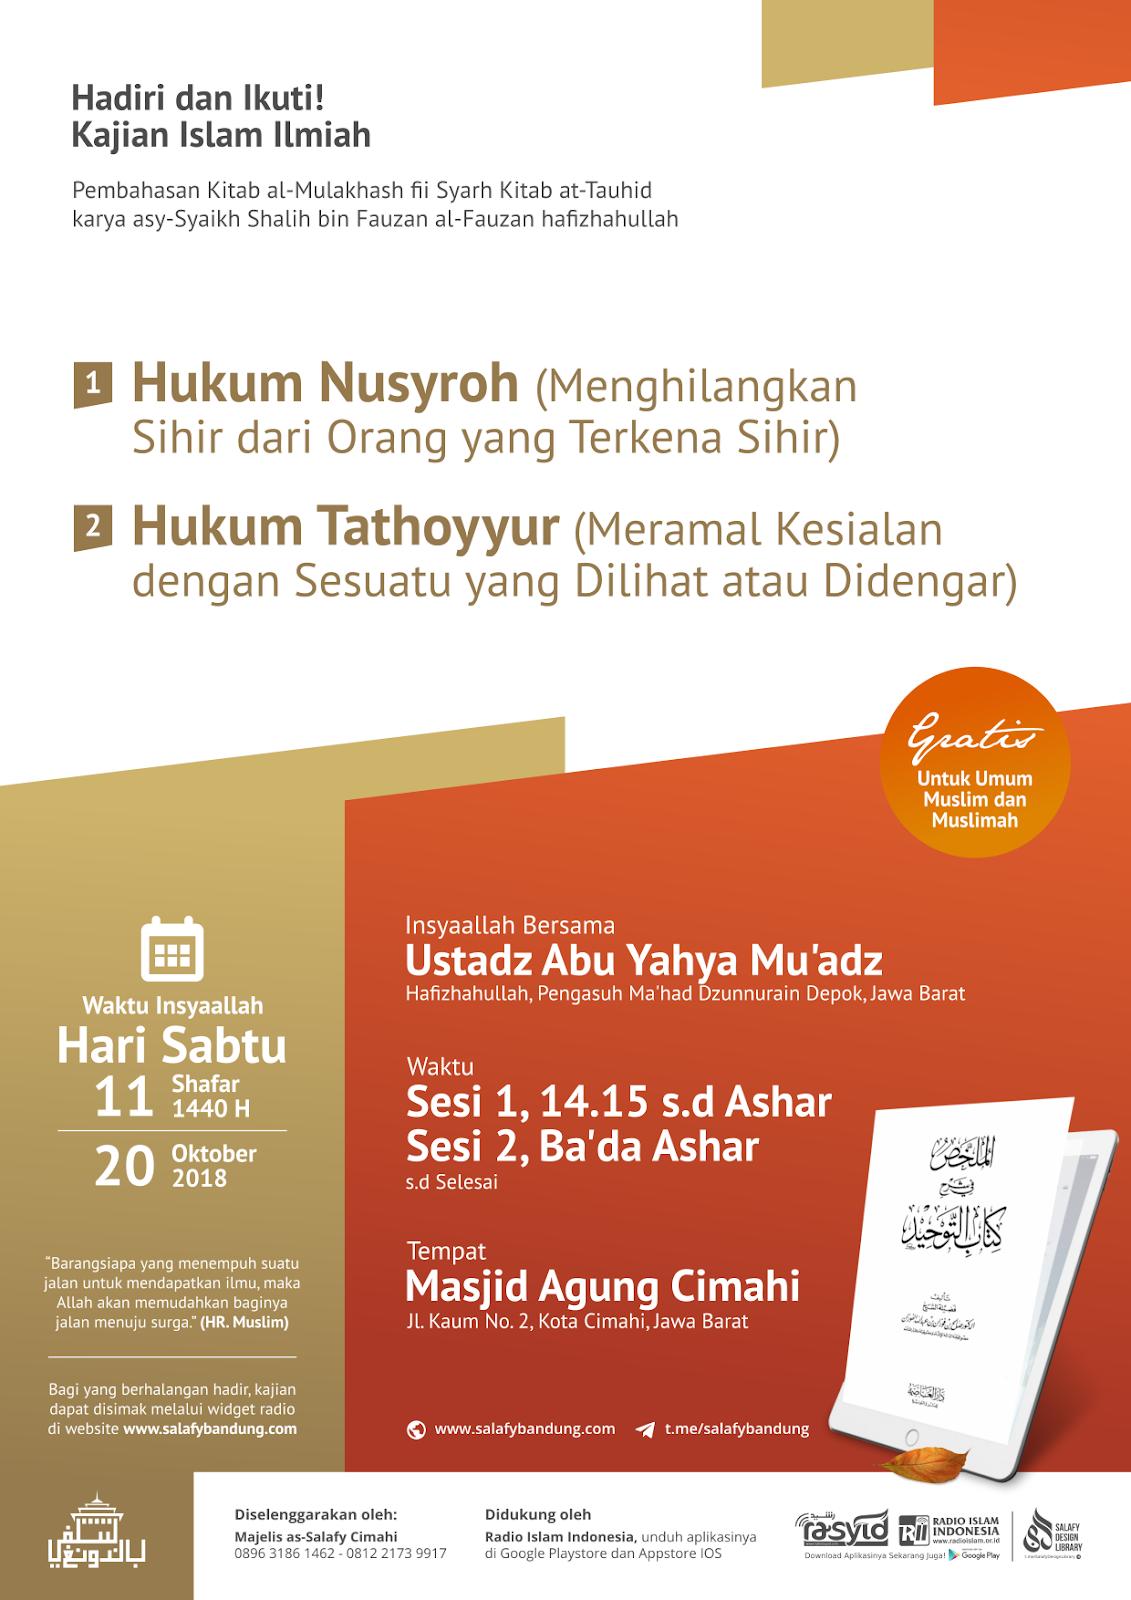 Kajian Islam Ilmiah Pembahasan Kitab al-Mulakhash fii Syarh Kitab at-Tauhid: Hukum Nusyroh dan Tathoyyur